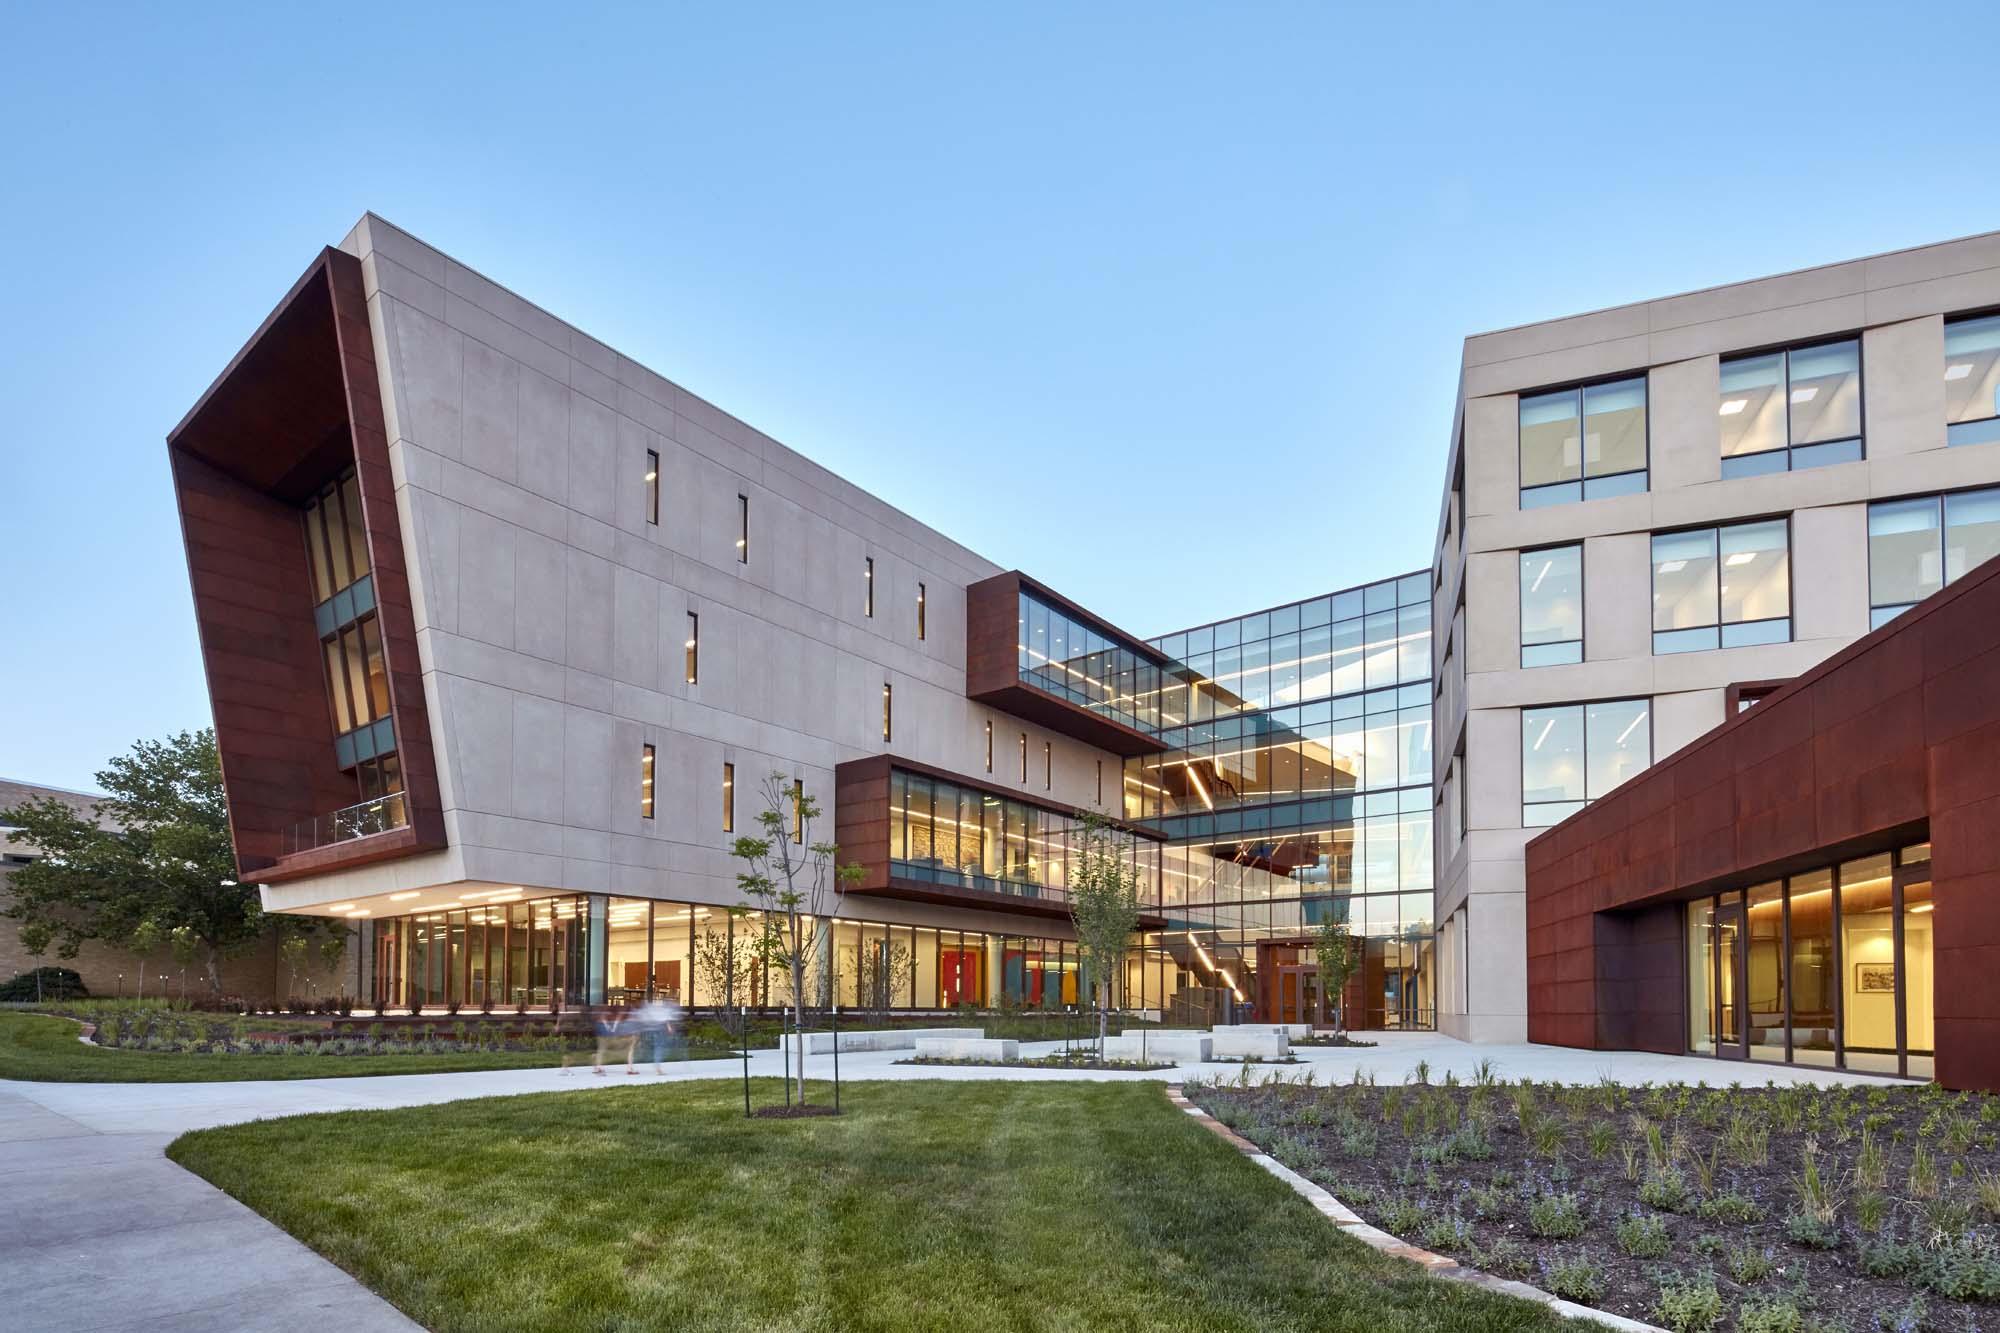 University of kansas capitol federal hall architect magazine gensler gastingerwalker for All american exterior solutions